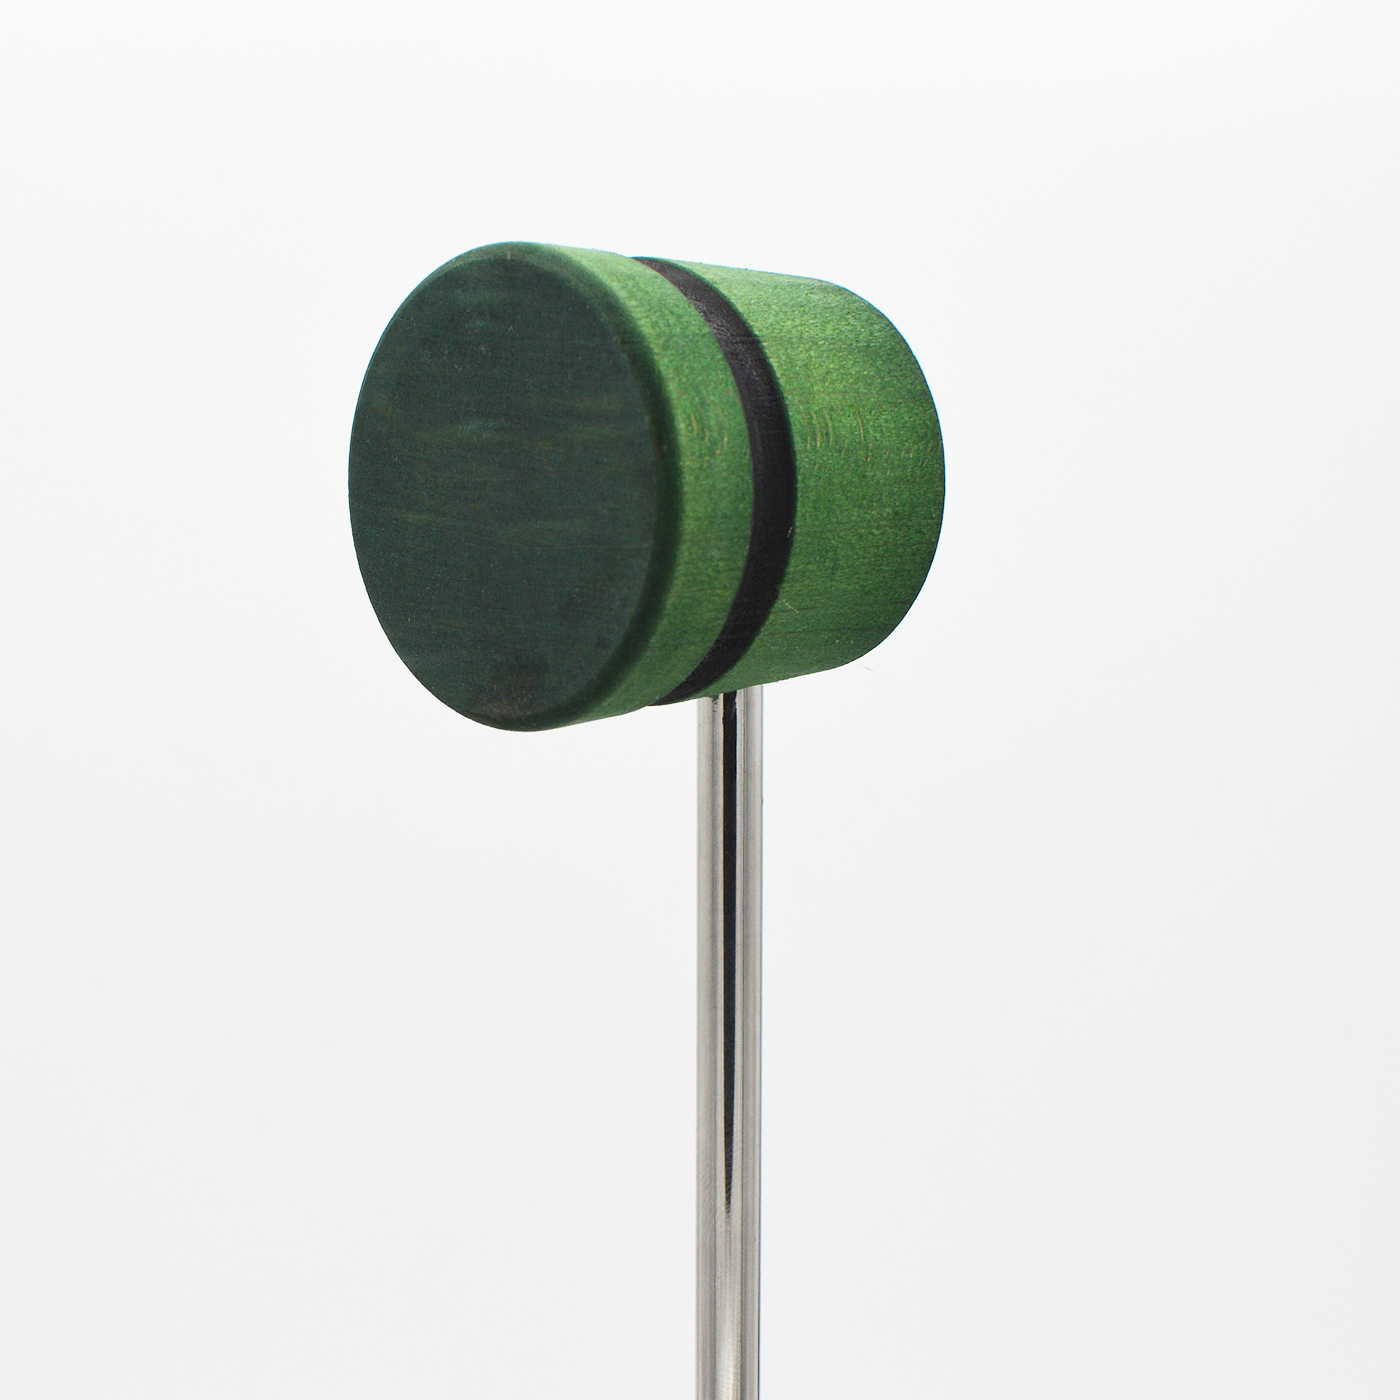 Lightweight, Green with Black Stripe